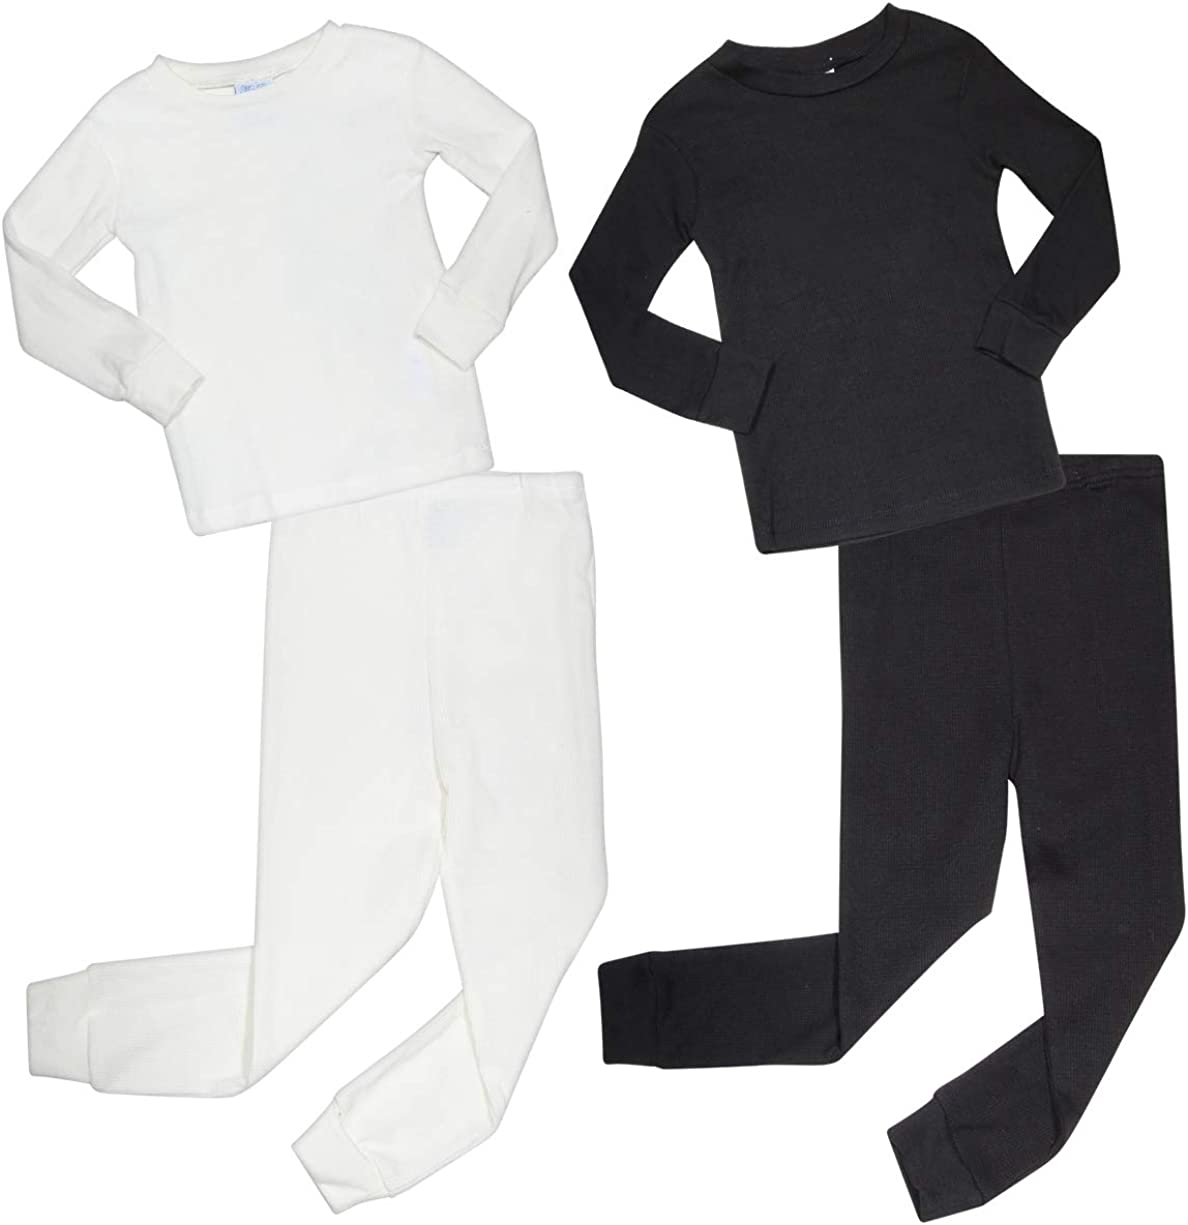 Arctic Hero Infant & Toddler Boys 4-Piece Thermal Long Underwear Set (2 Full Sets)